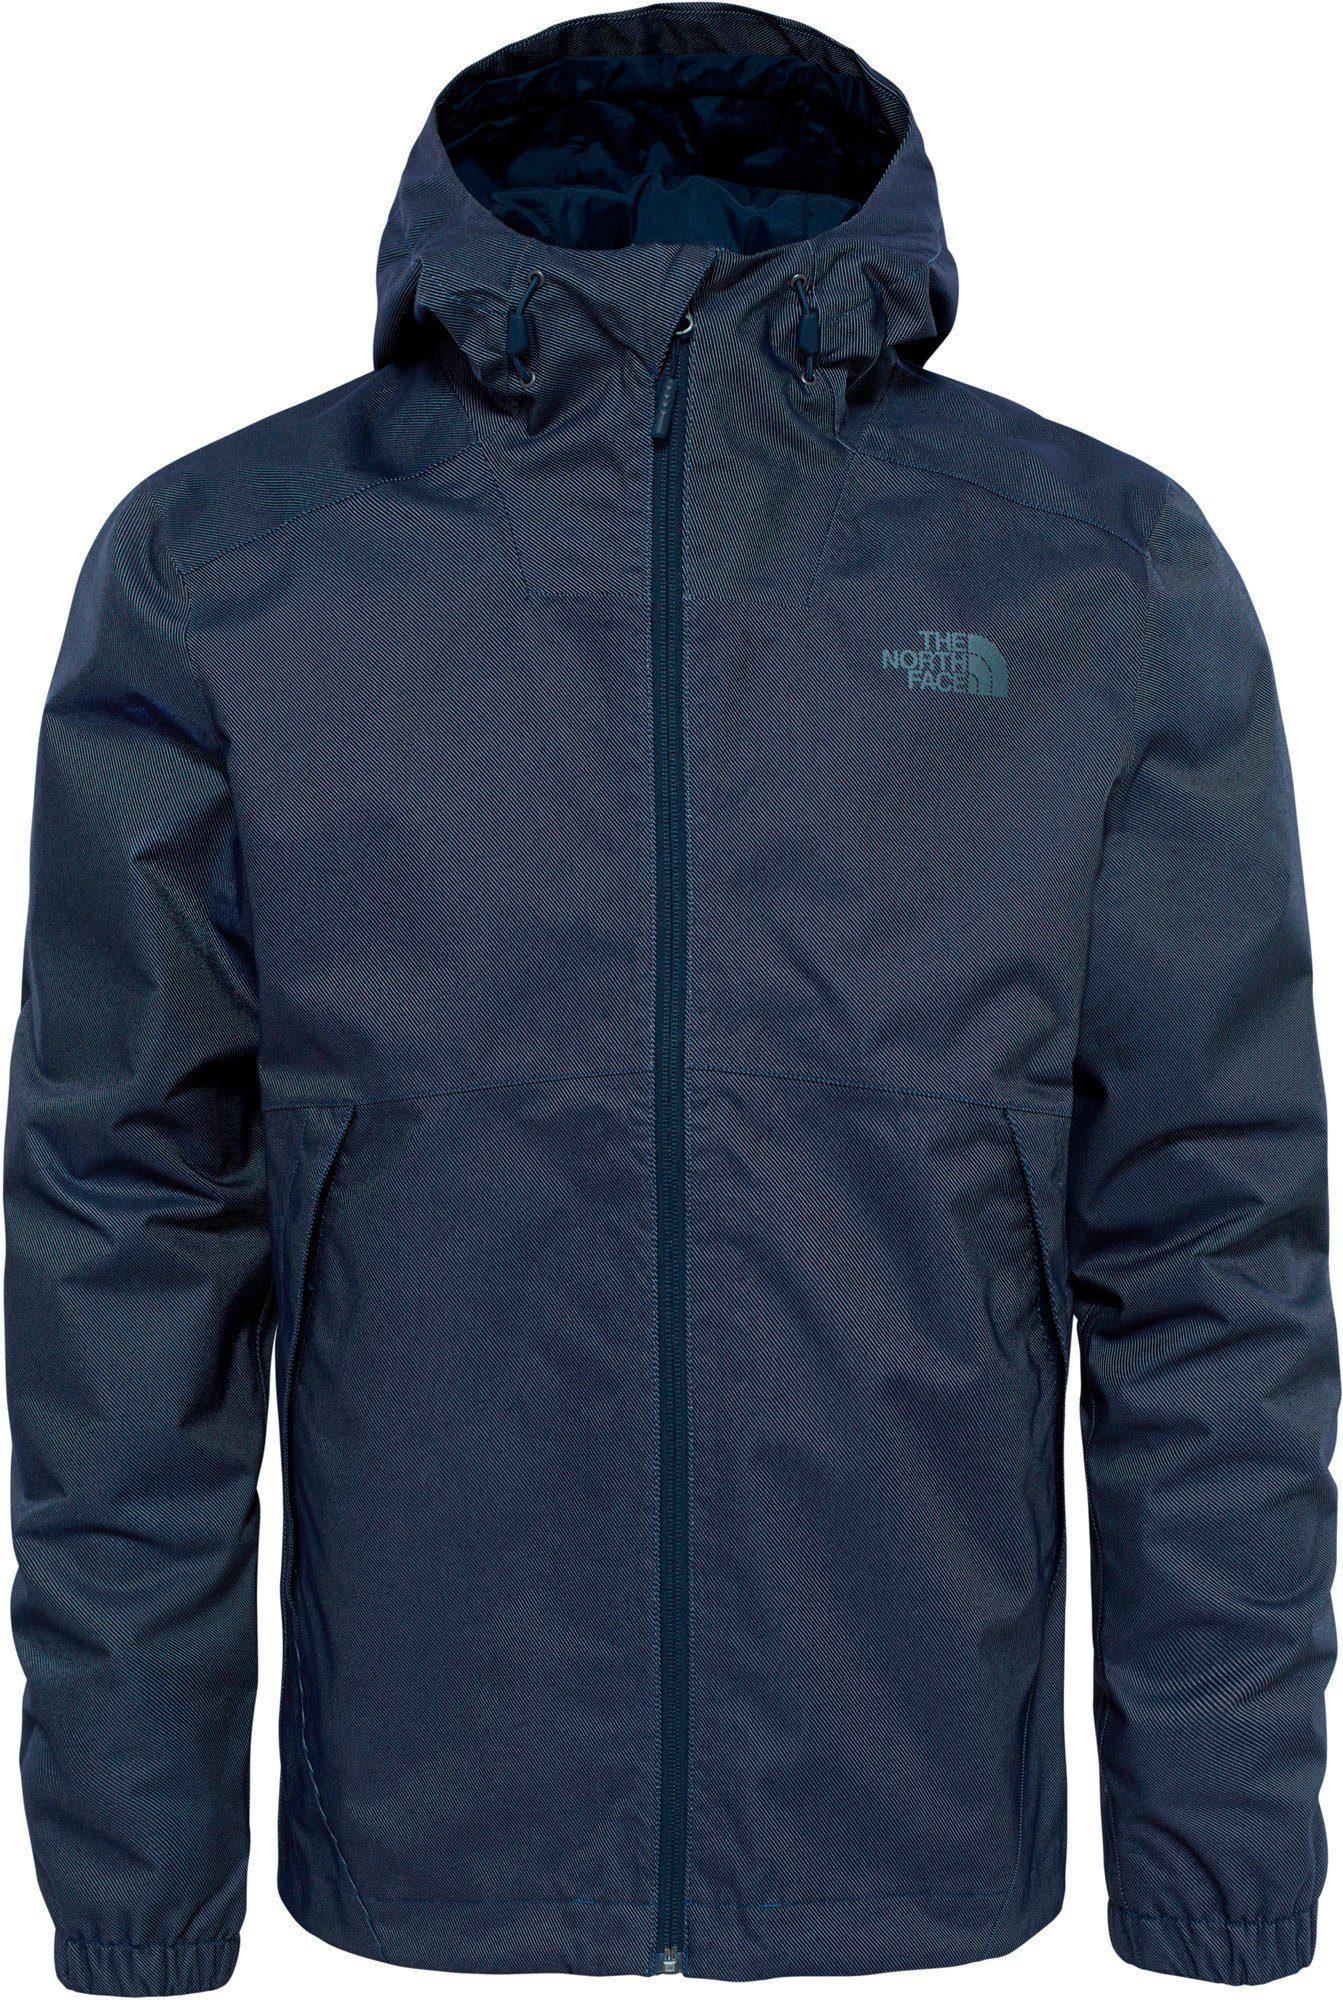 The North Face Outdoorjacke »Millerton Jacket Men«